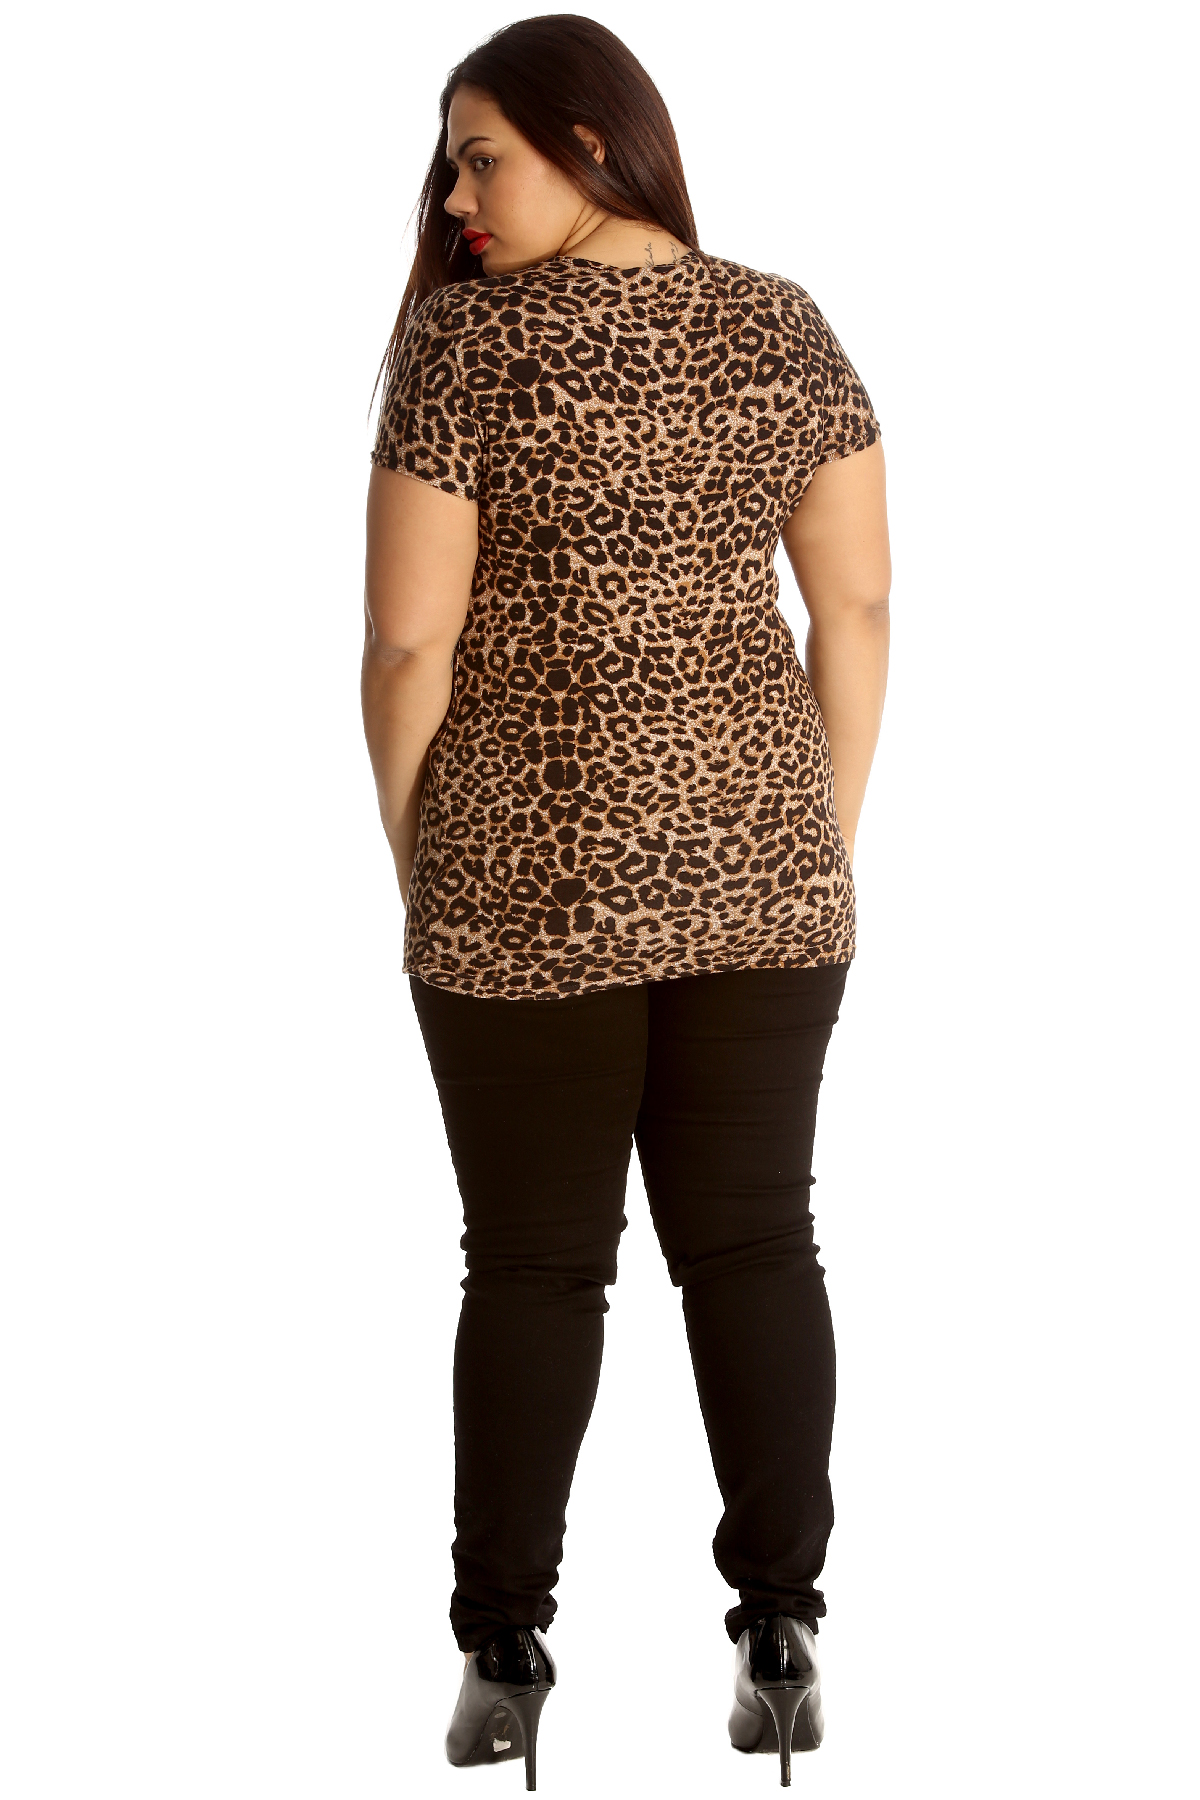 Neu Damen Übergröße Hemd Frau Top Leopard Drucken T-Shirt Tunika Tier Nouvelle